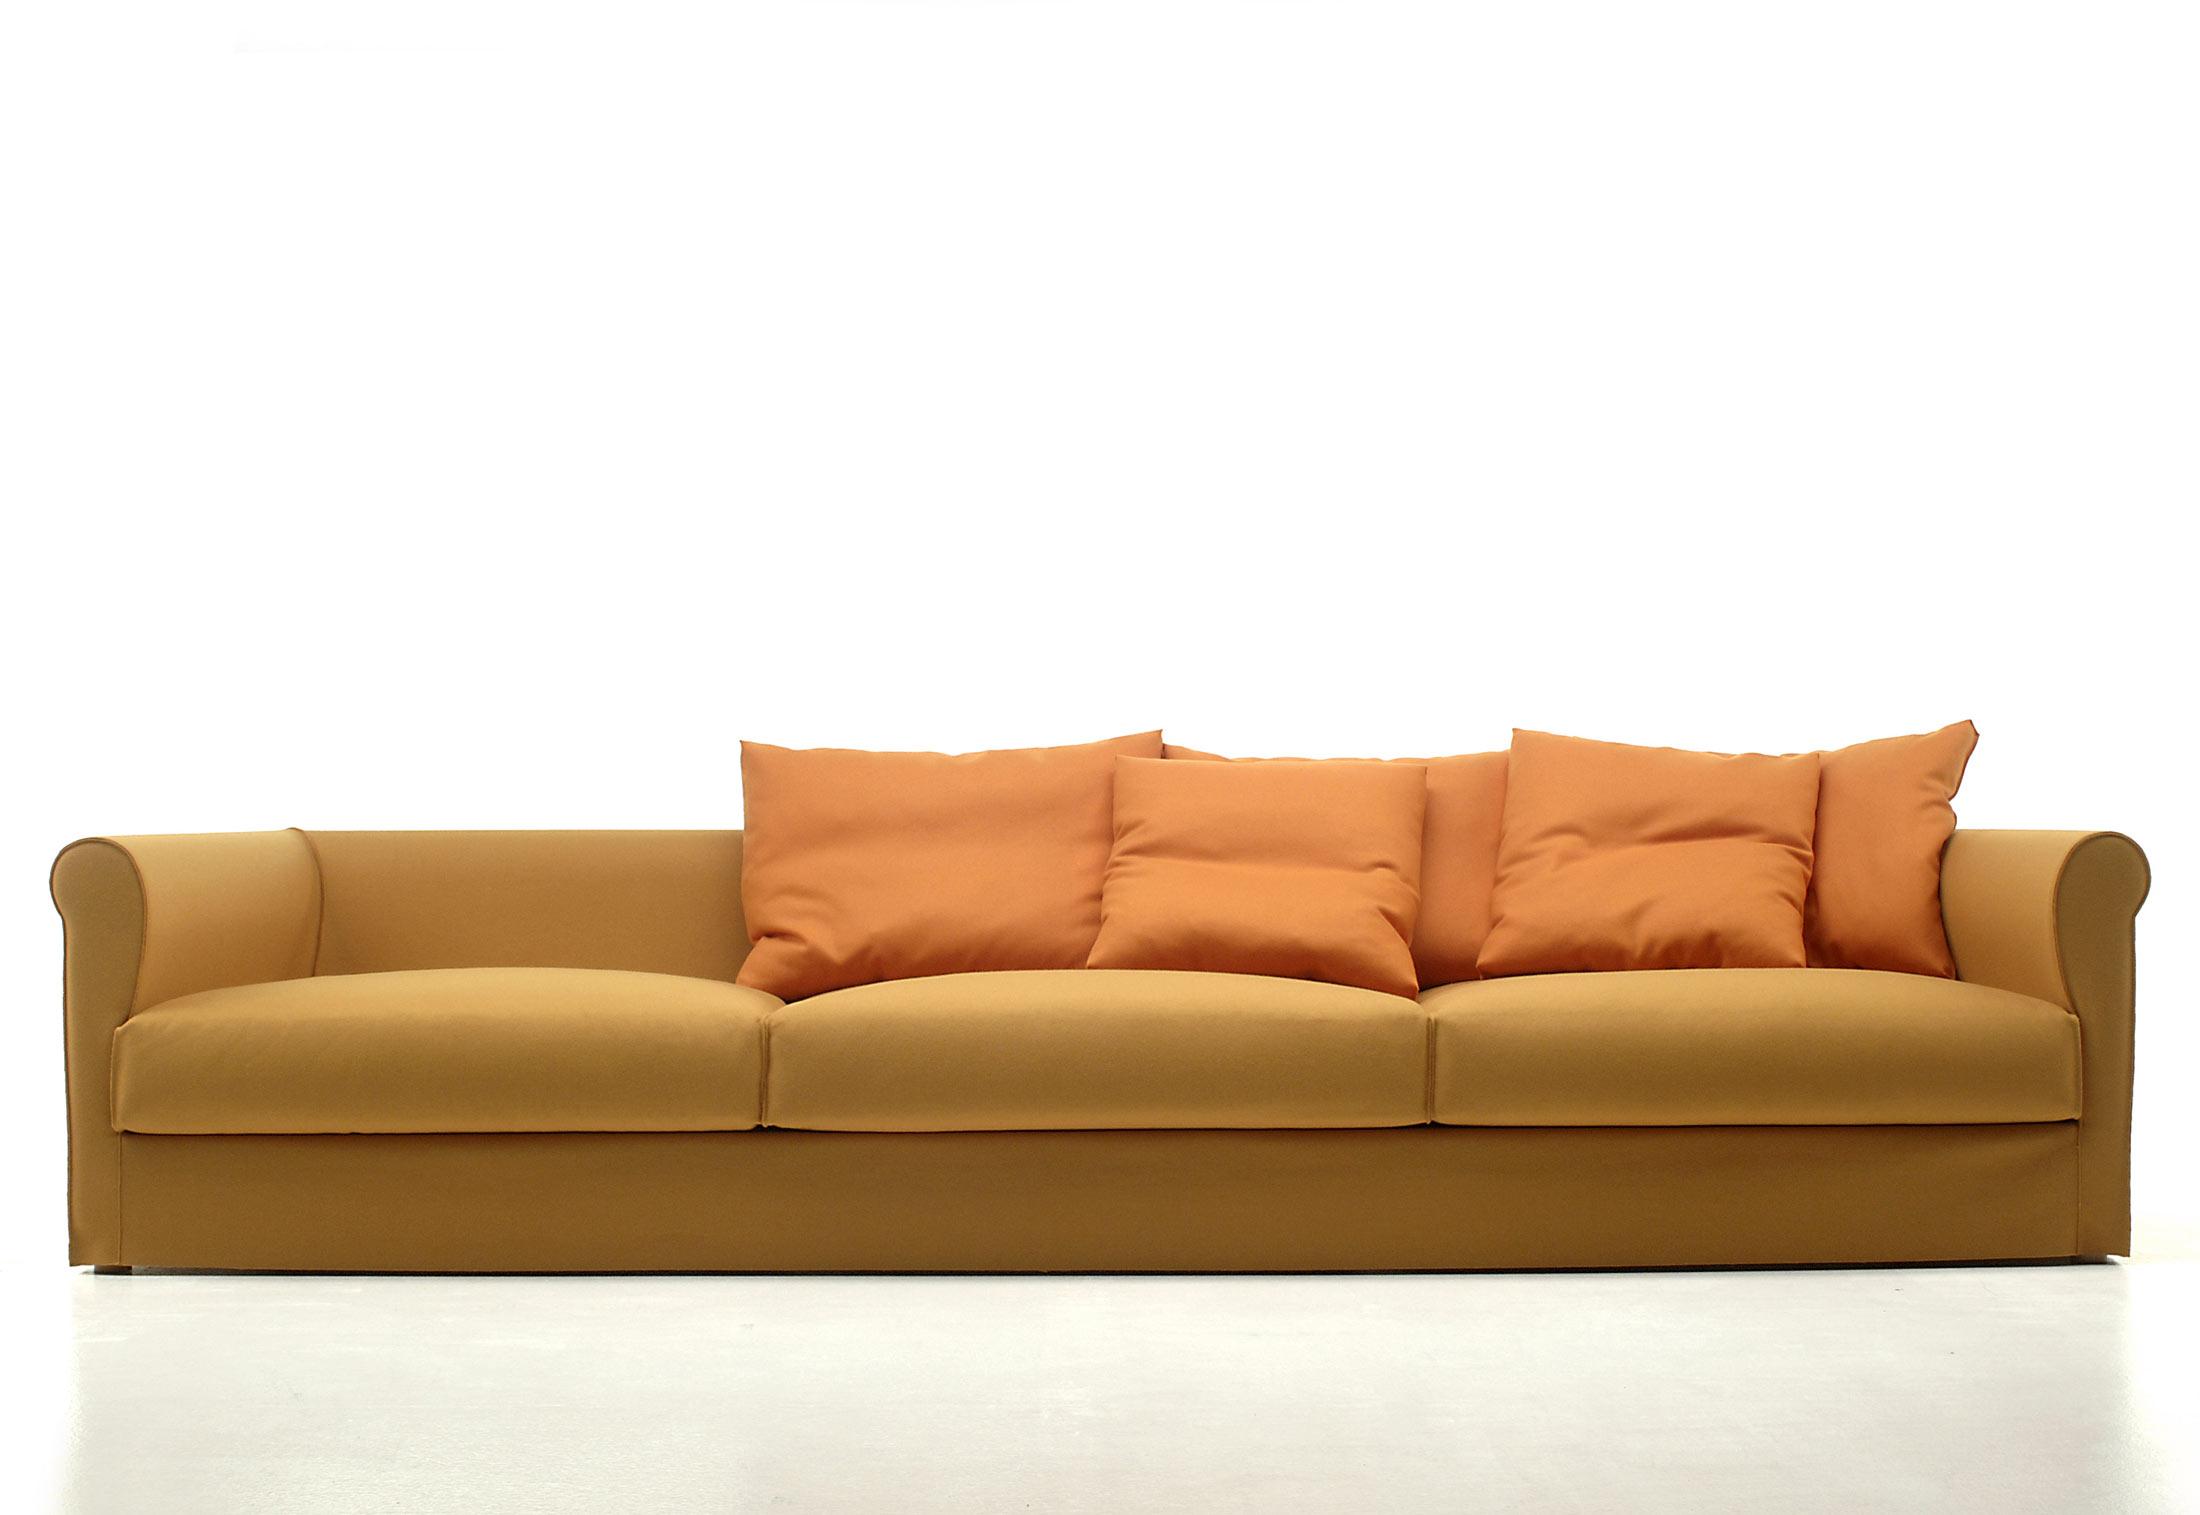 dorian sofa by living divani stylepark. Black Bedroom Furniture Sets. Home Design Ideas